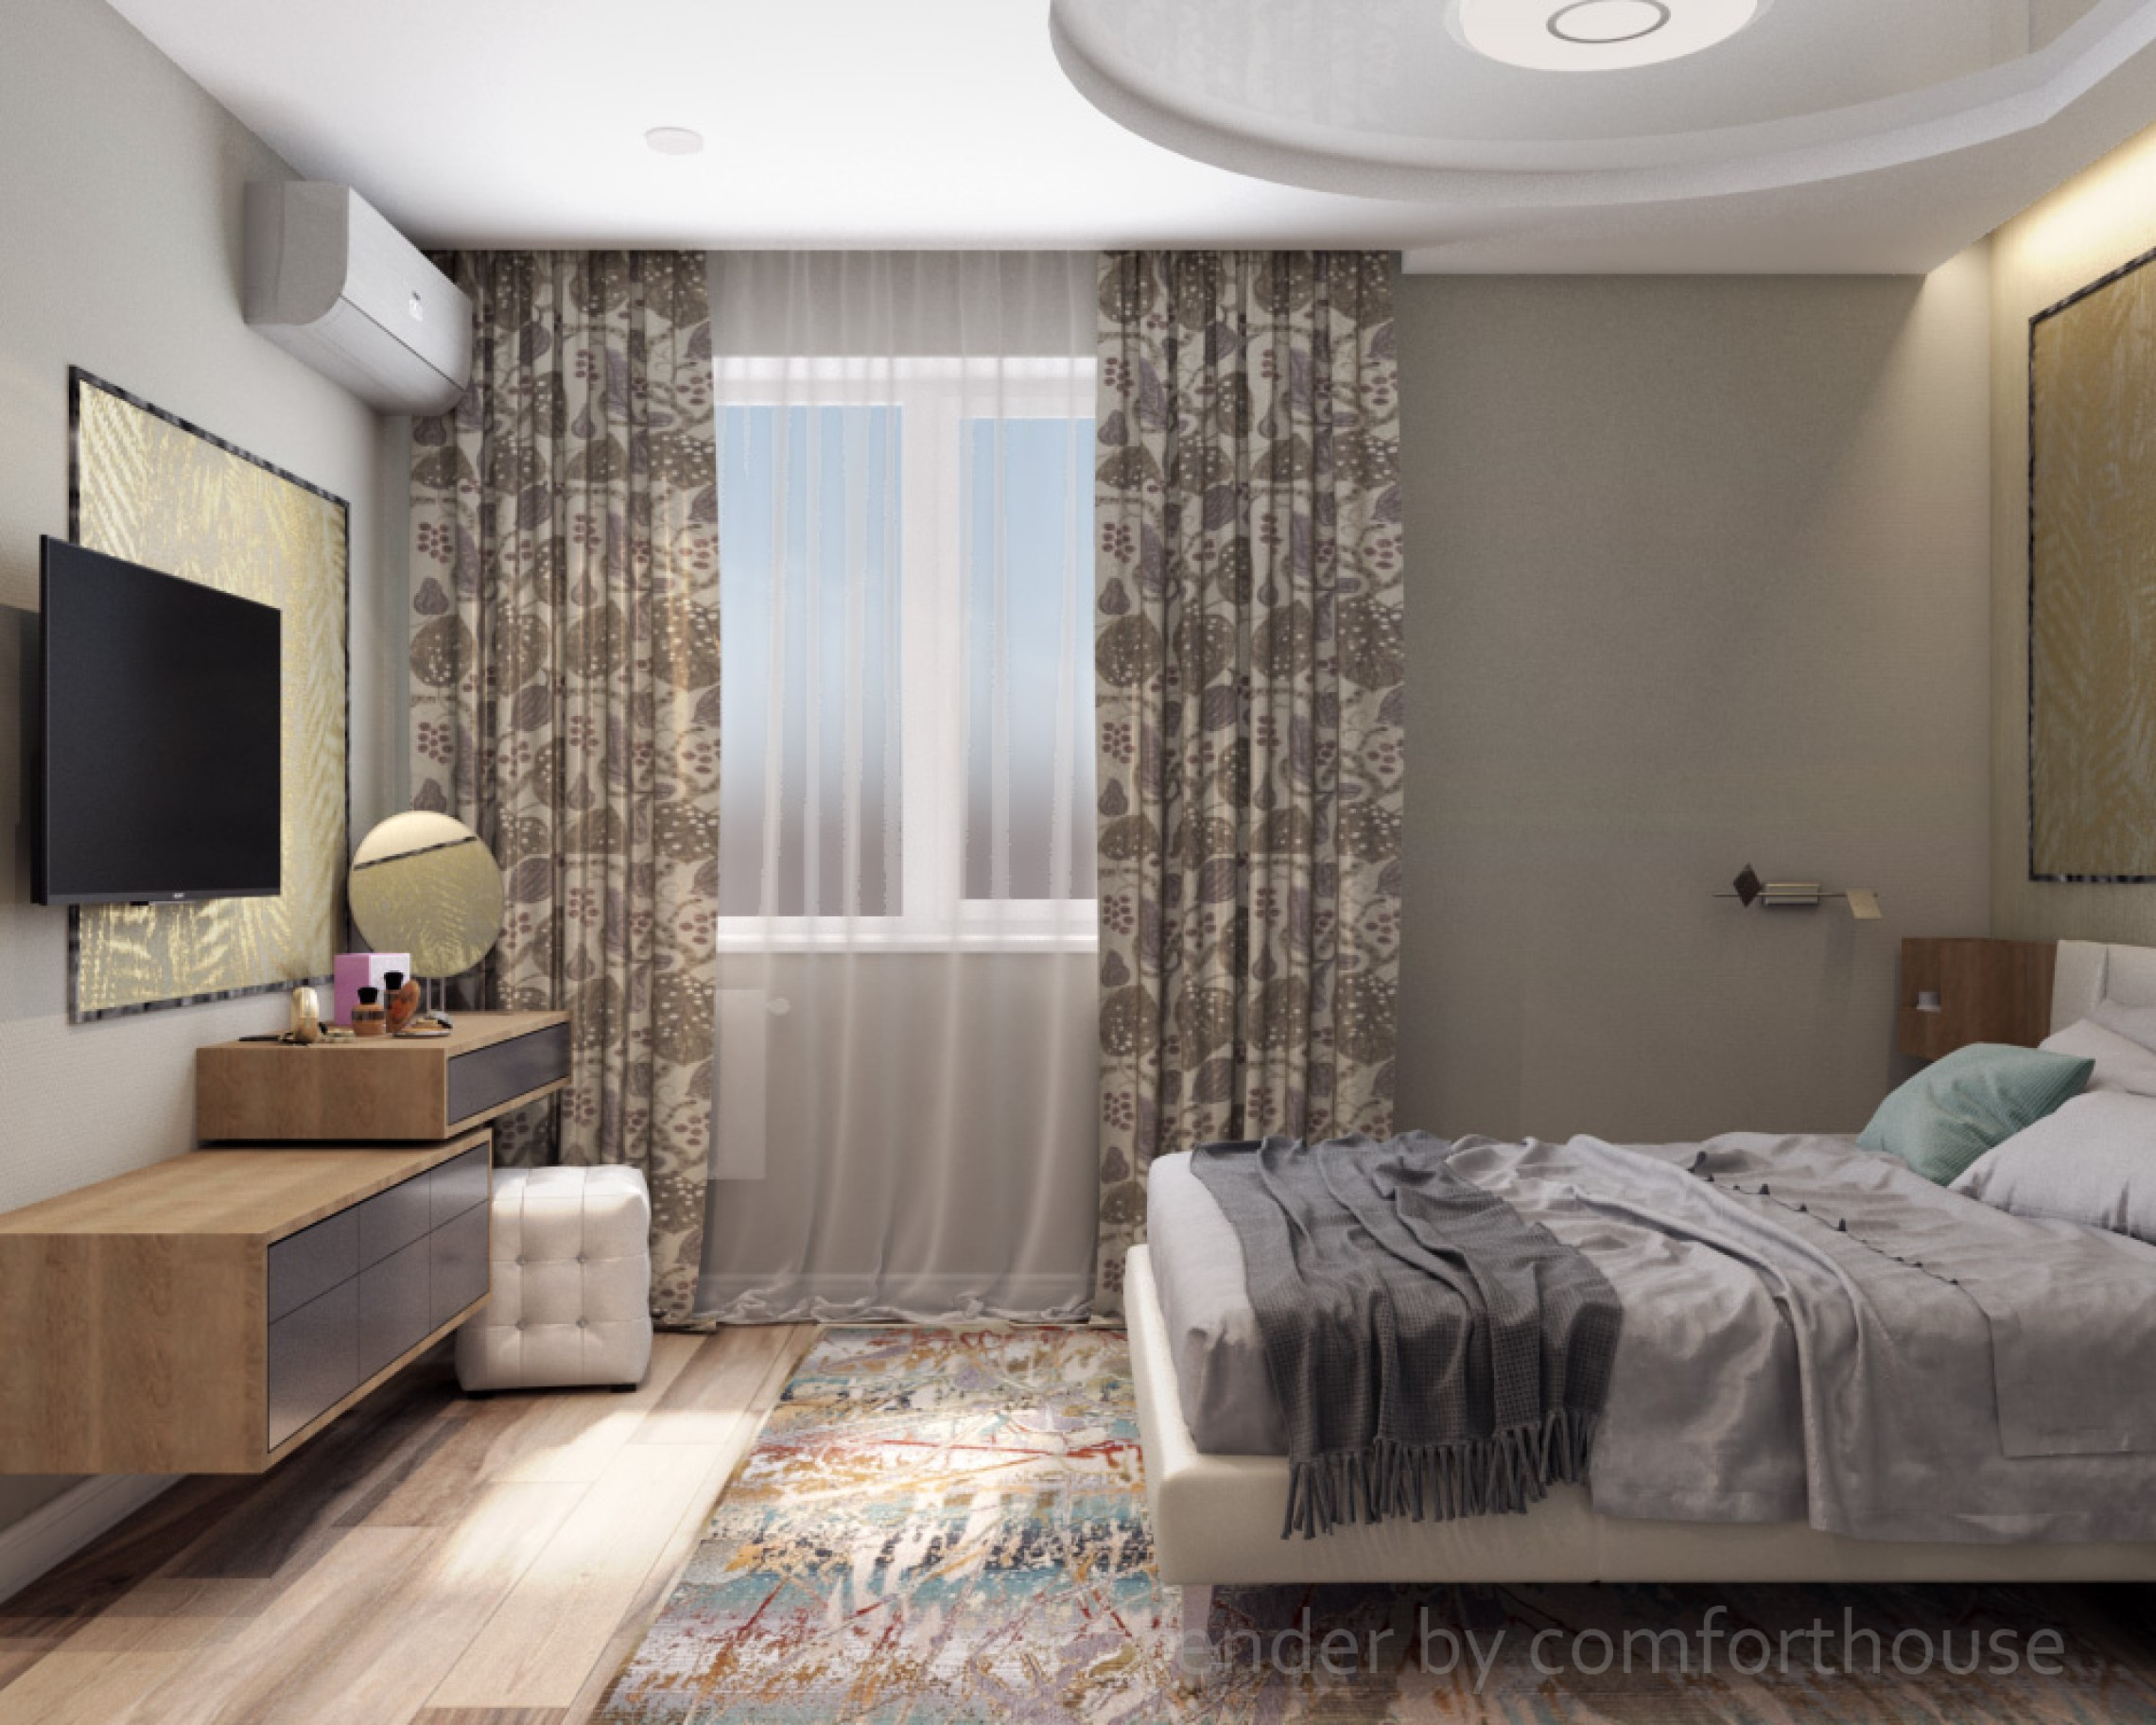 interior design badroom